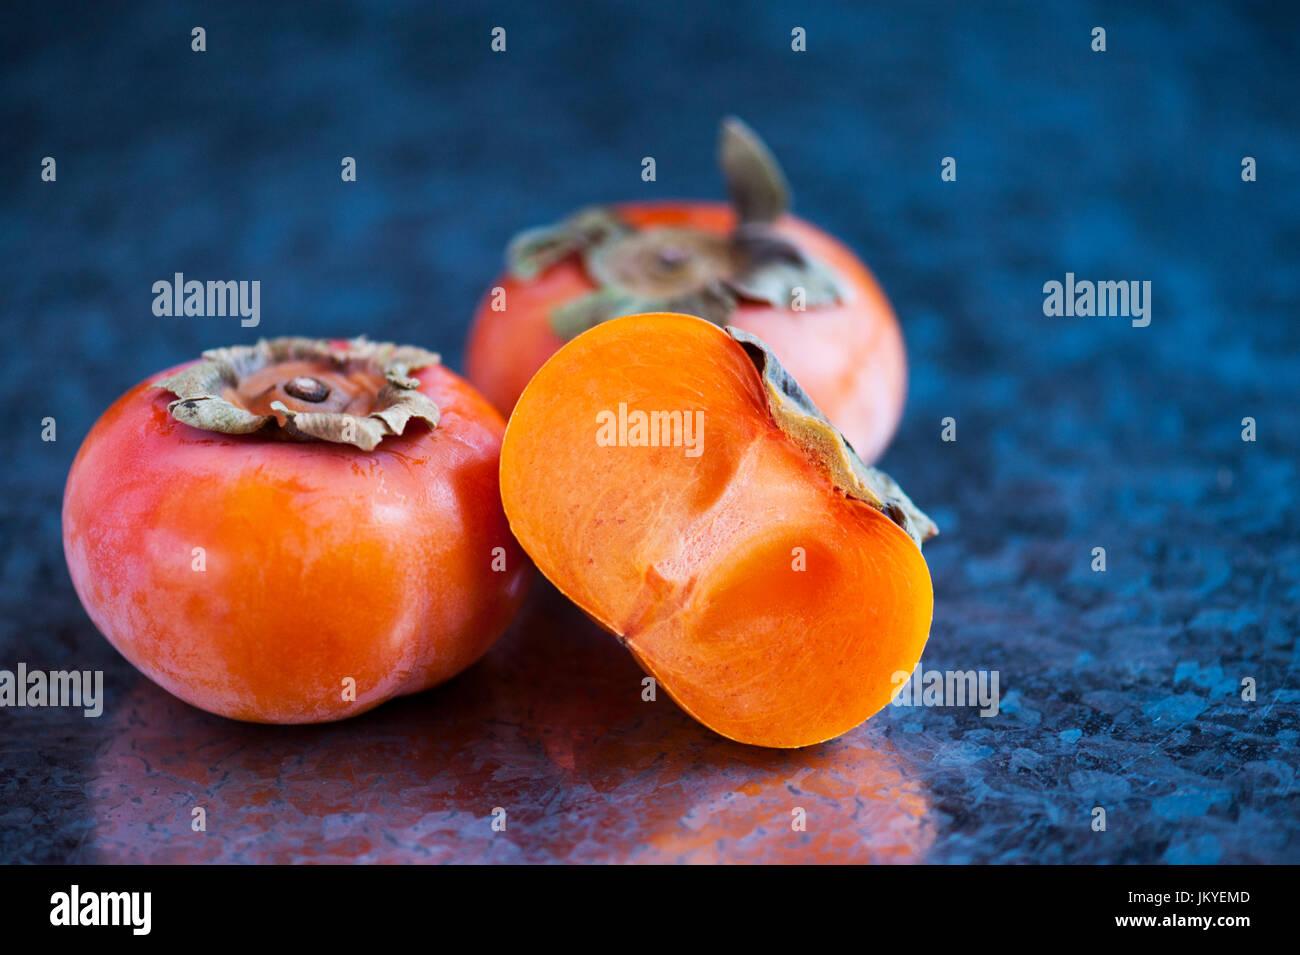 Persimmon - Stock Image